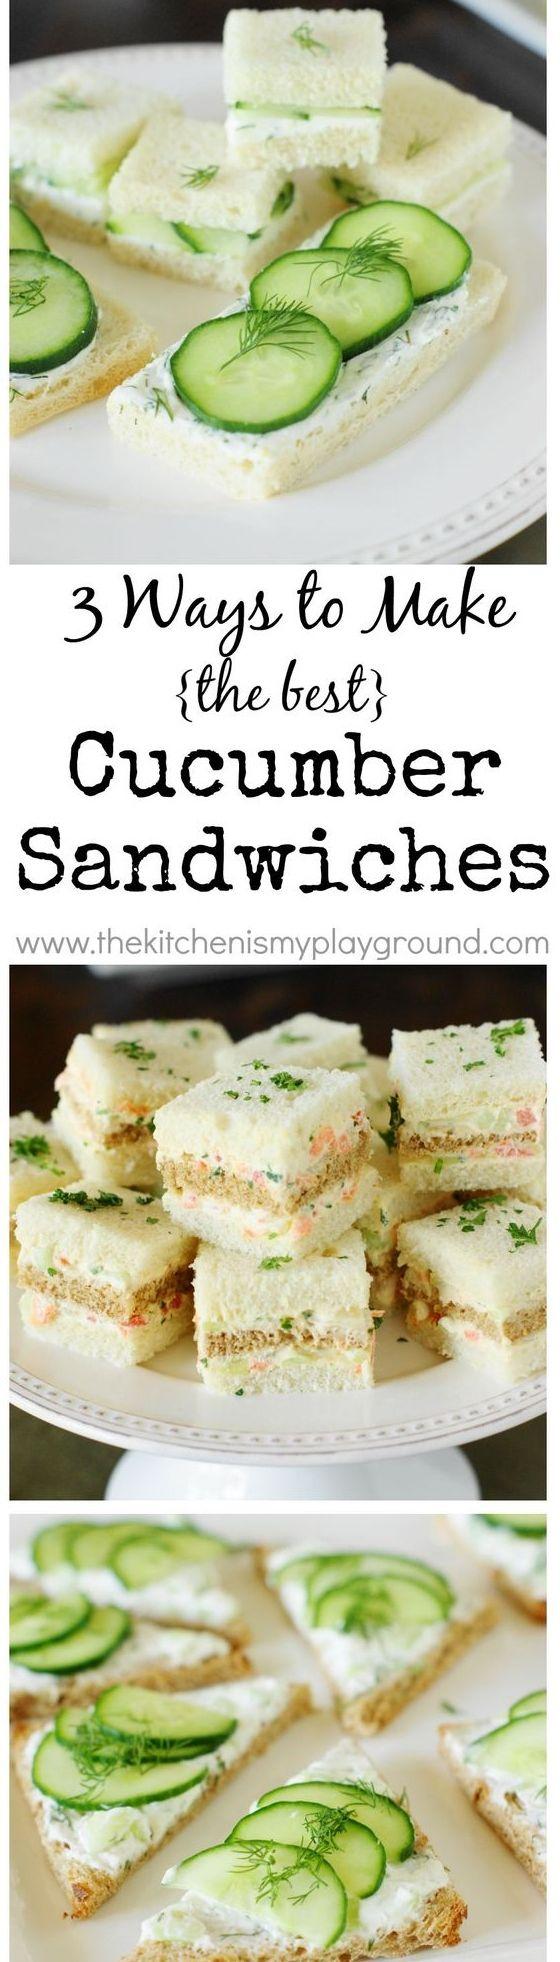 High tea menus and recipes - Cucumber Tea Sandwiches 3 Spreads 3 Ways